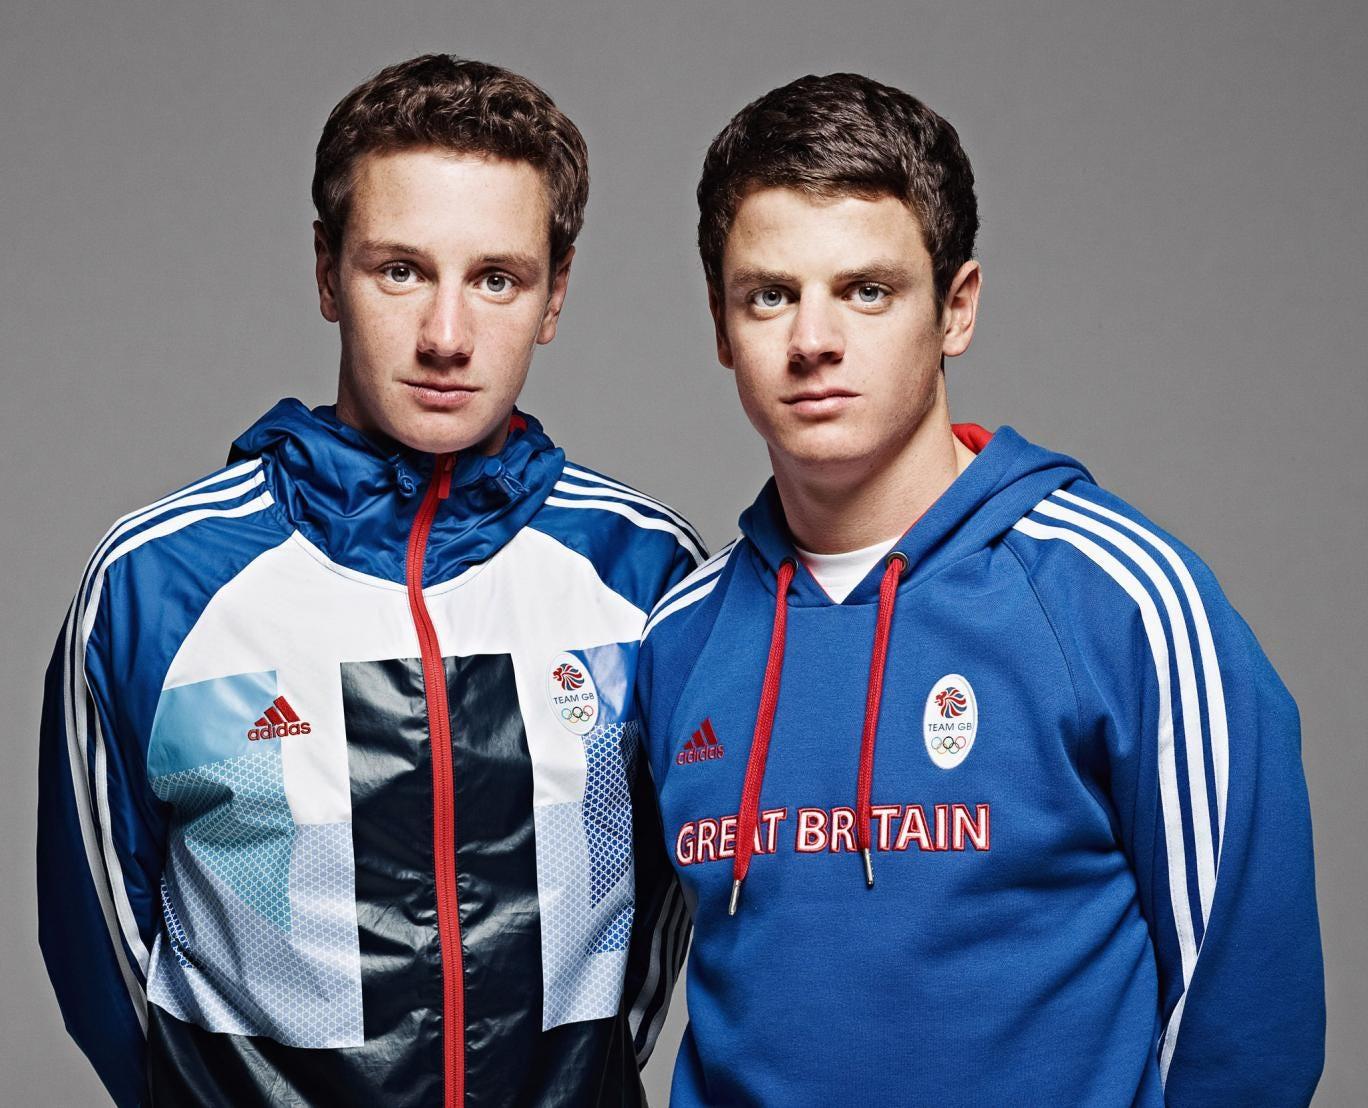 Alistair and Jonny Brownlee, Champion Triathletes